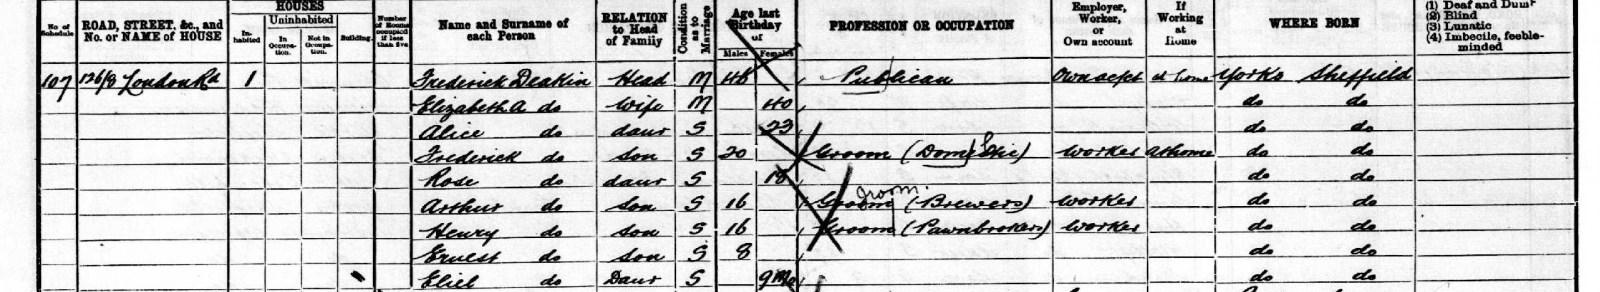 Deakin 1901 Census.jpg